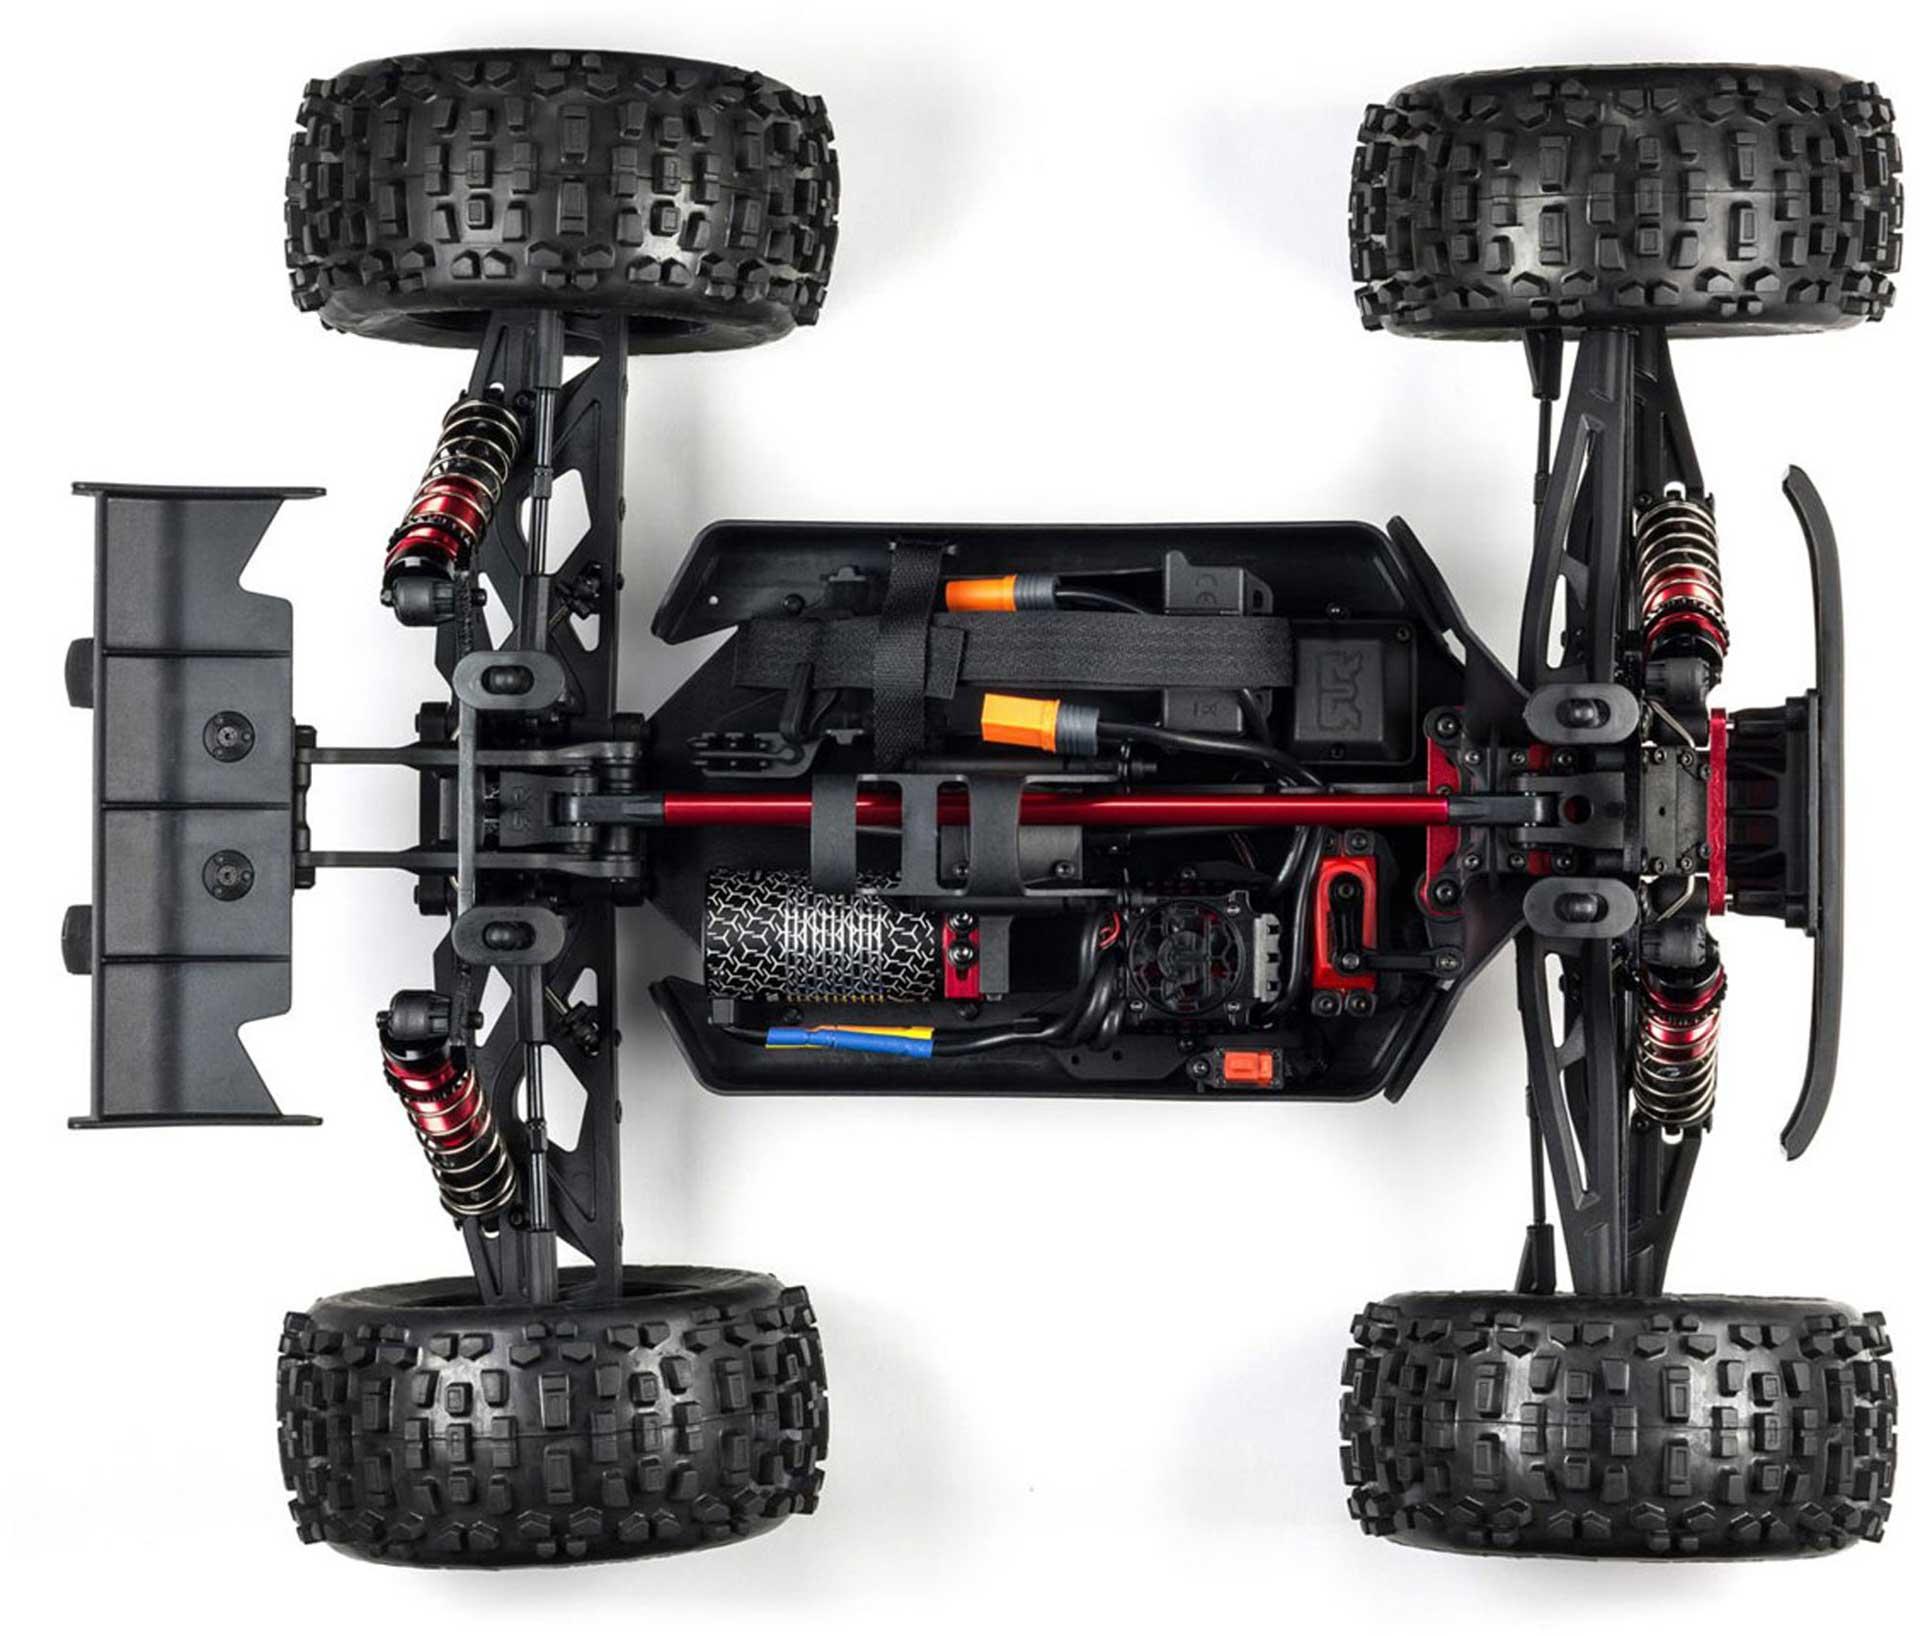 Arrma OUTCAST 6S 4WD BLX 1/8 STUNT TRUCK SILVER